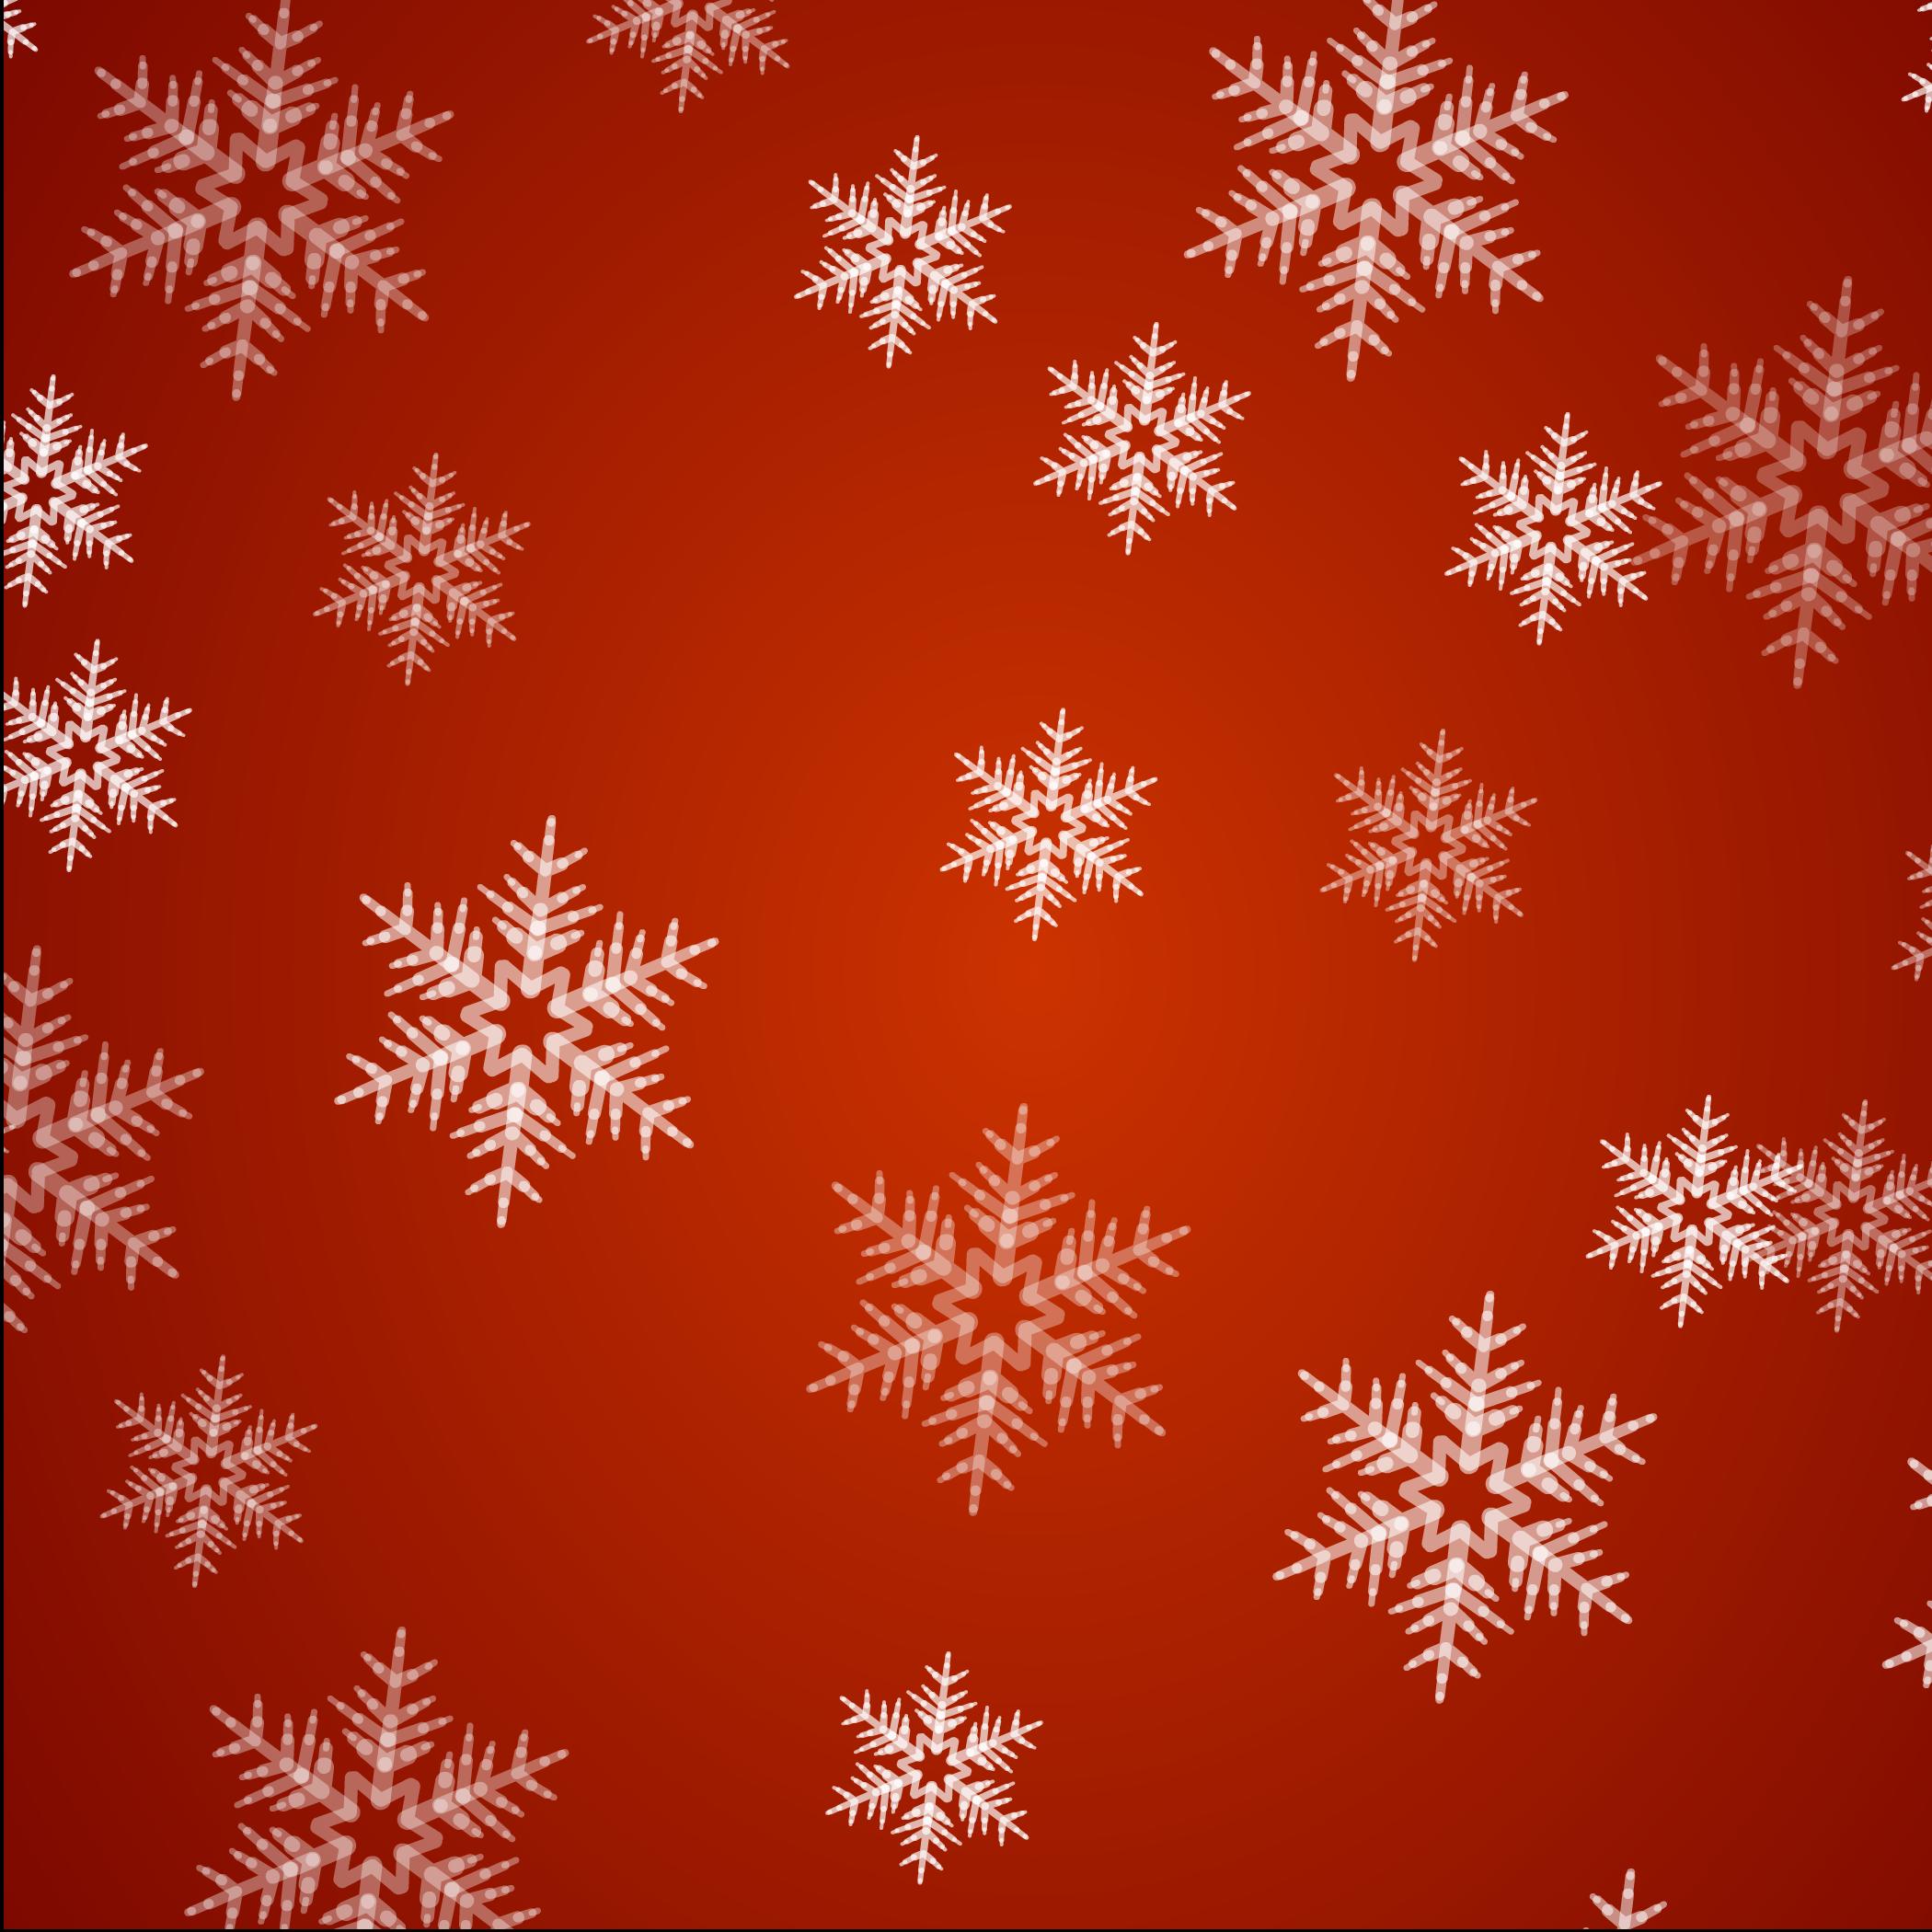 Fondo de Copos de Nieve (ID 9288)